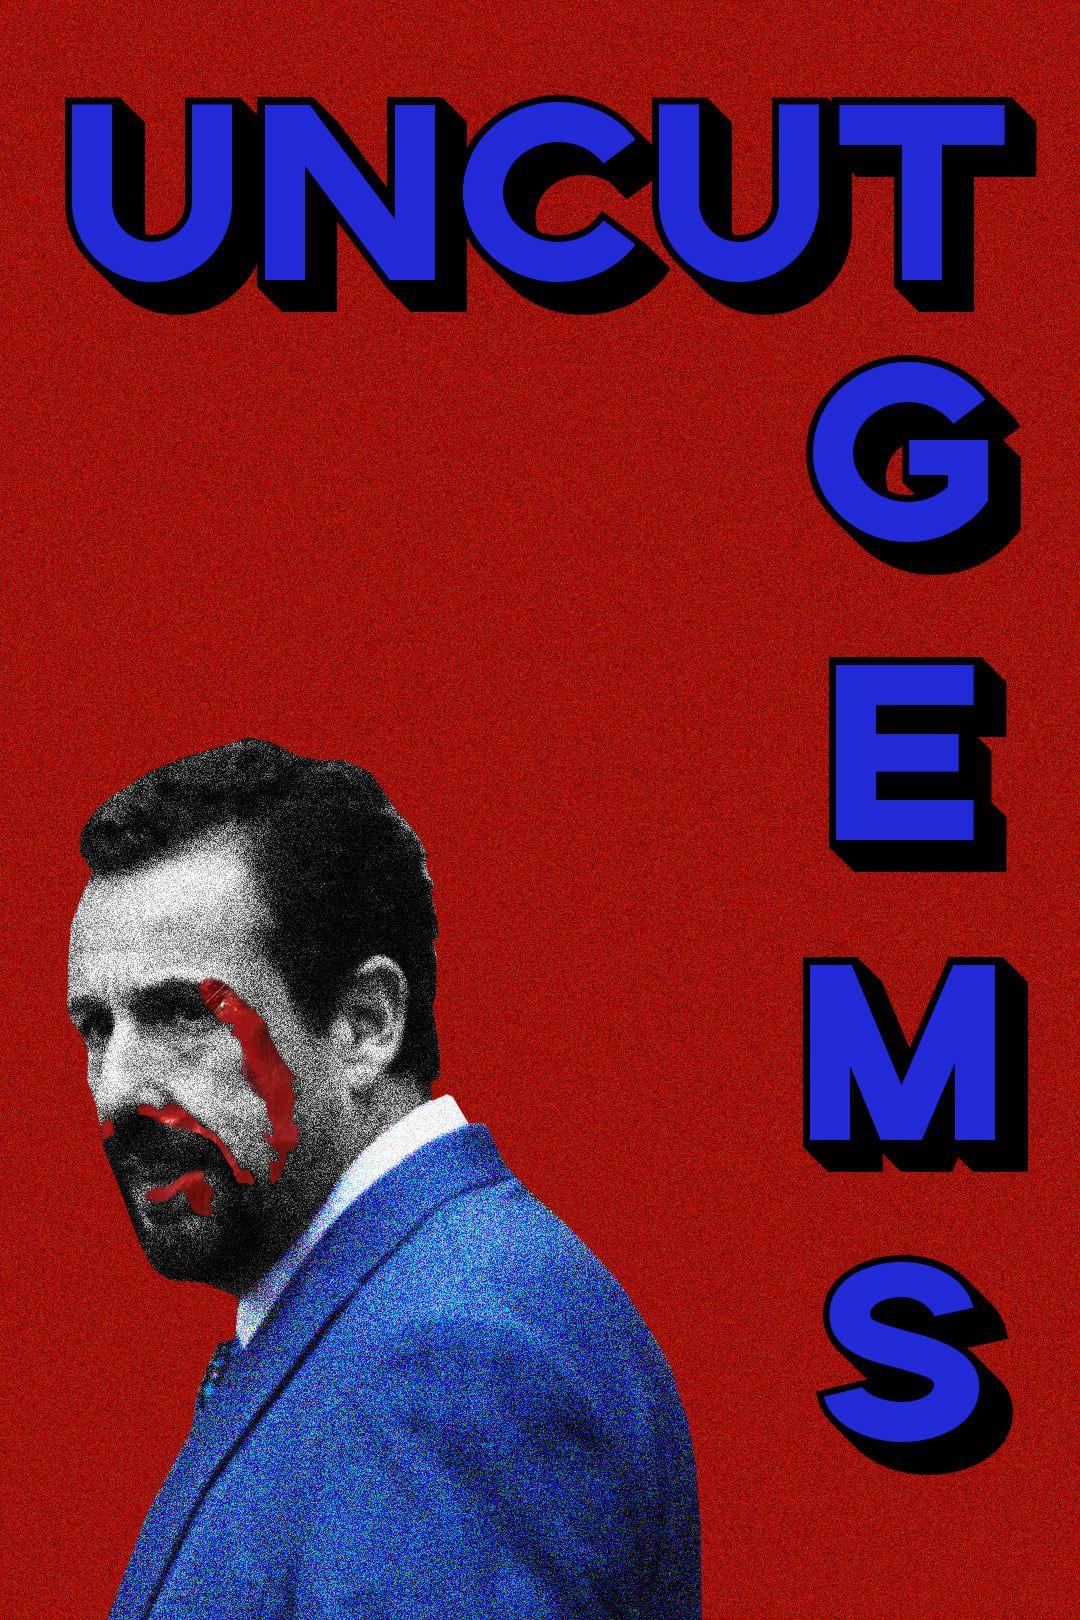 [NEDZ] Uncut Gems … Teljes Film Online (Uncut Gems 2019